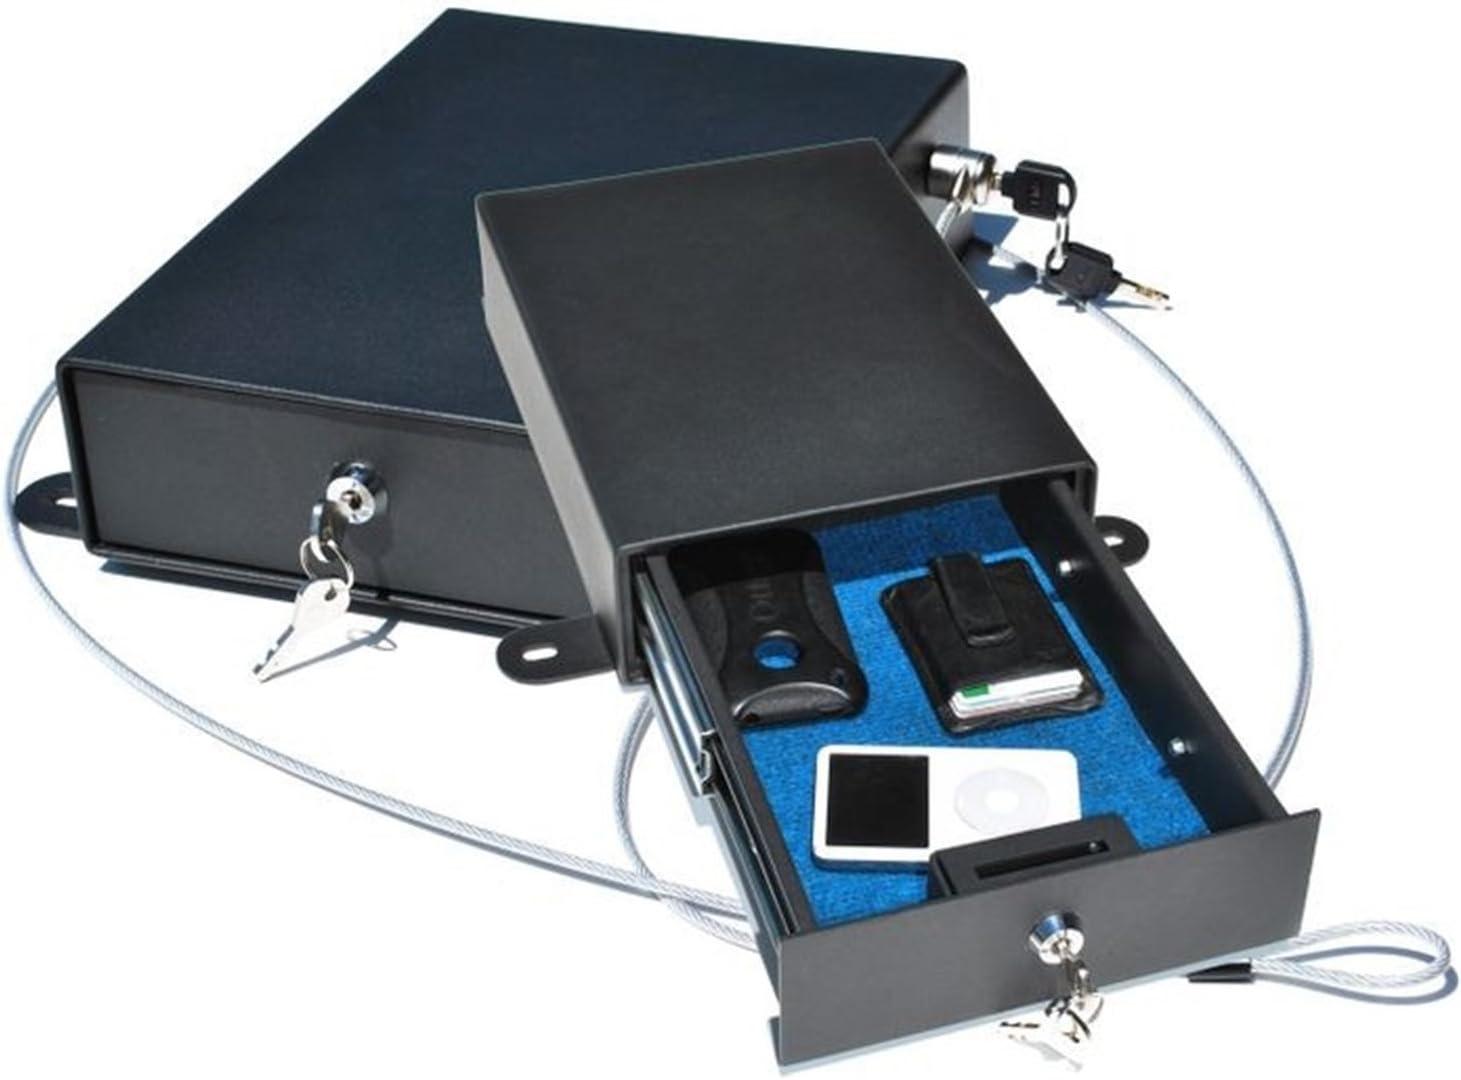 Accessories Bestop 4264301 Center Console Lockbox for 2011-2018 ...